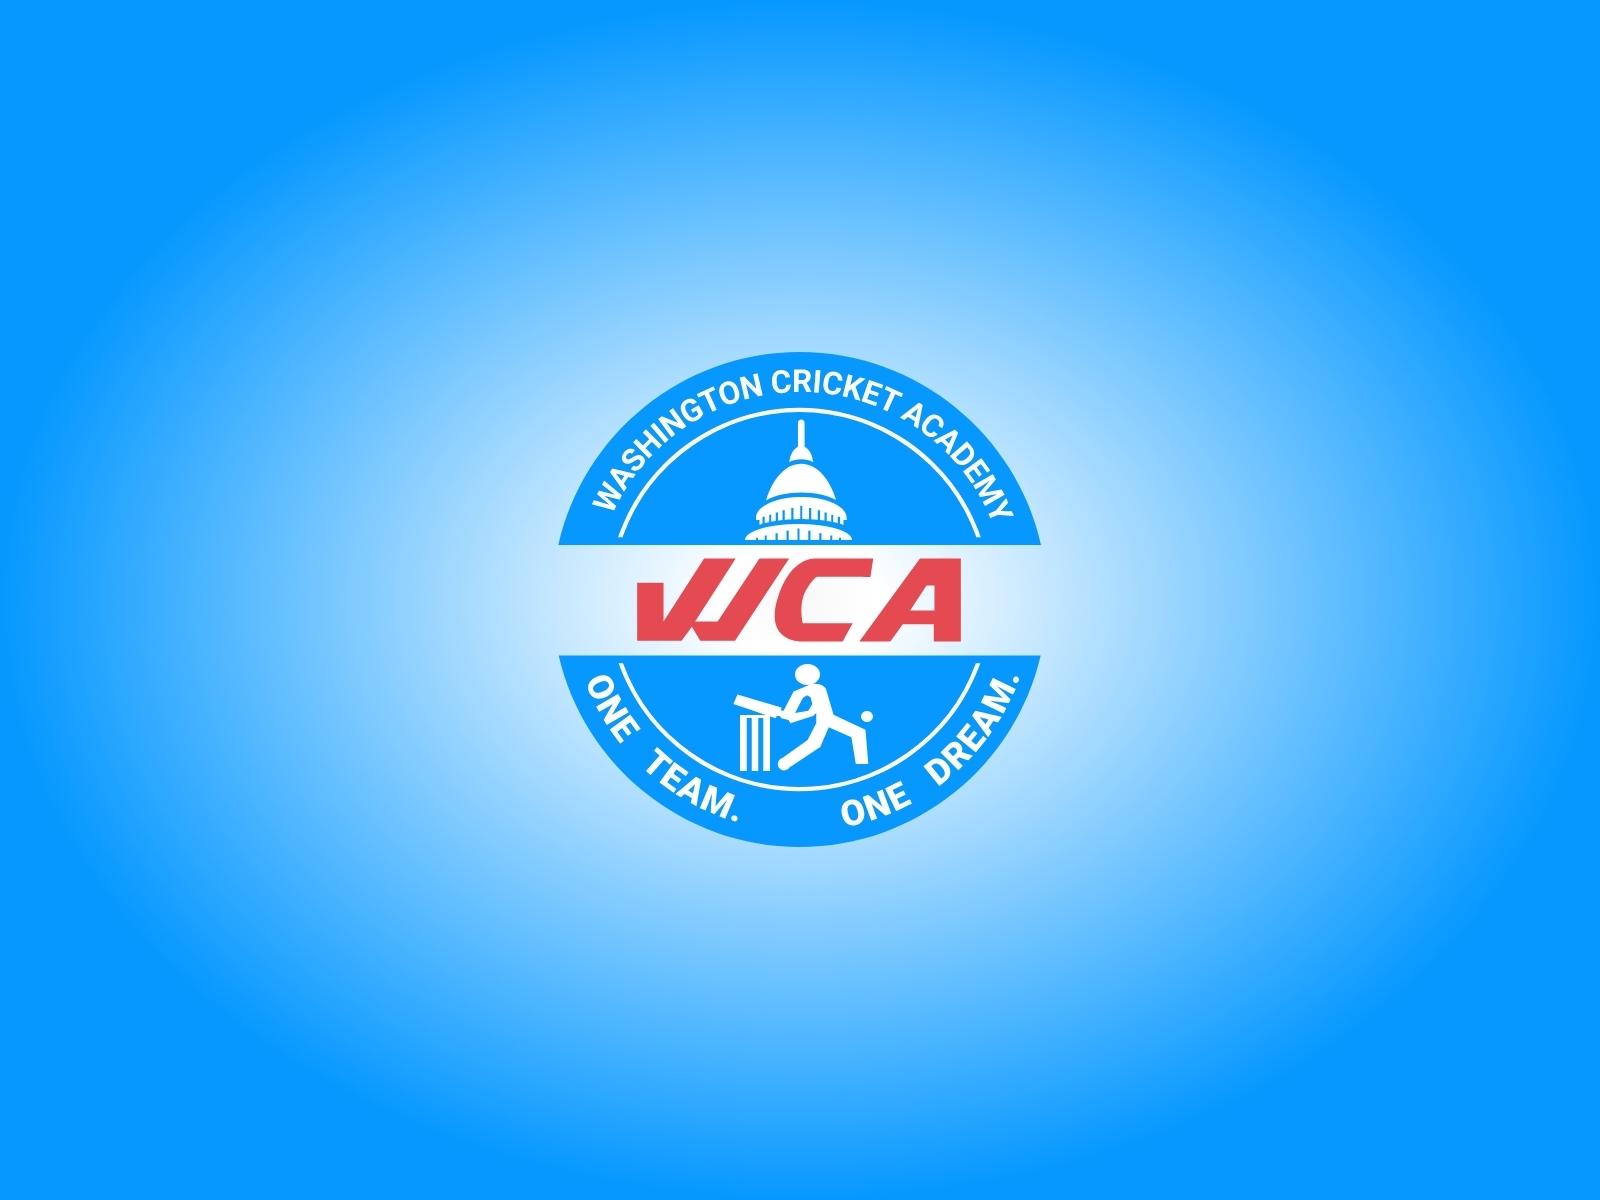 Washington Cricket Academy